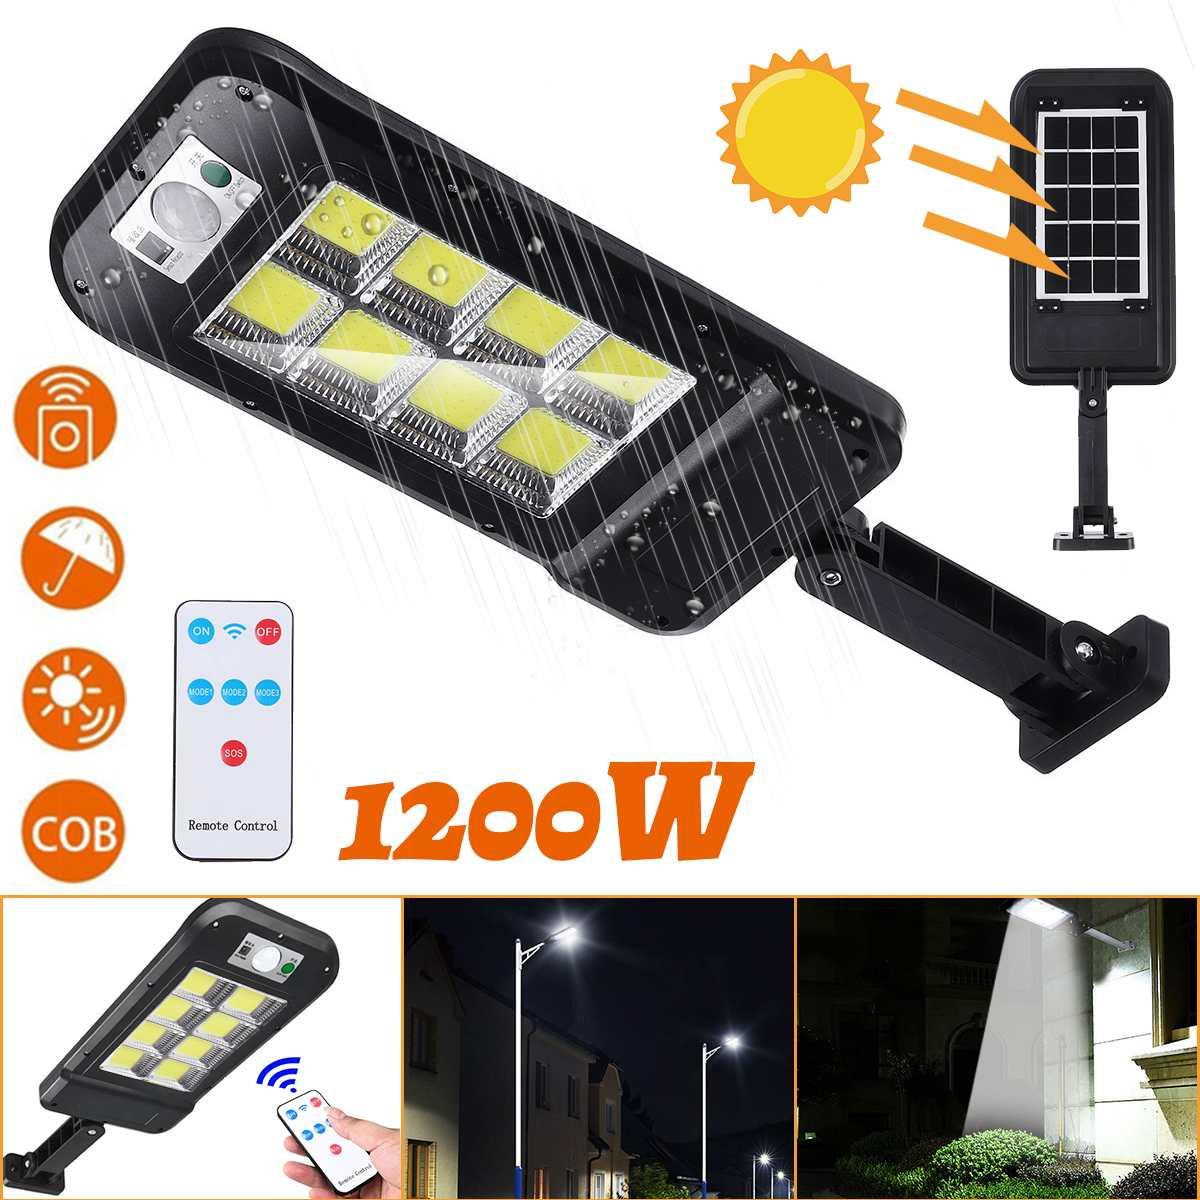 1200w pir sensor de movimento controle remoto jardim lâmpada 160cob led à prova d160água luz solar ao ar livre lâmpada rua parede luz